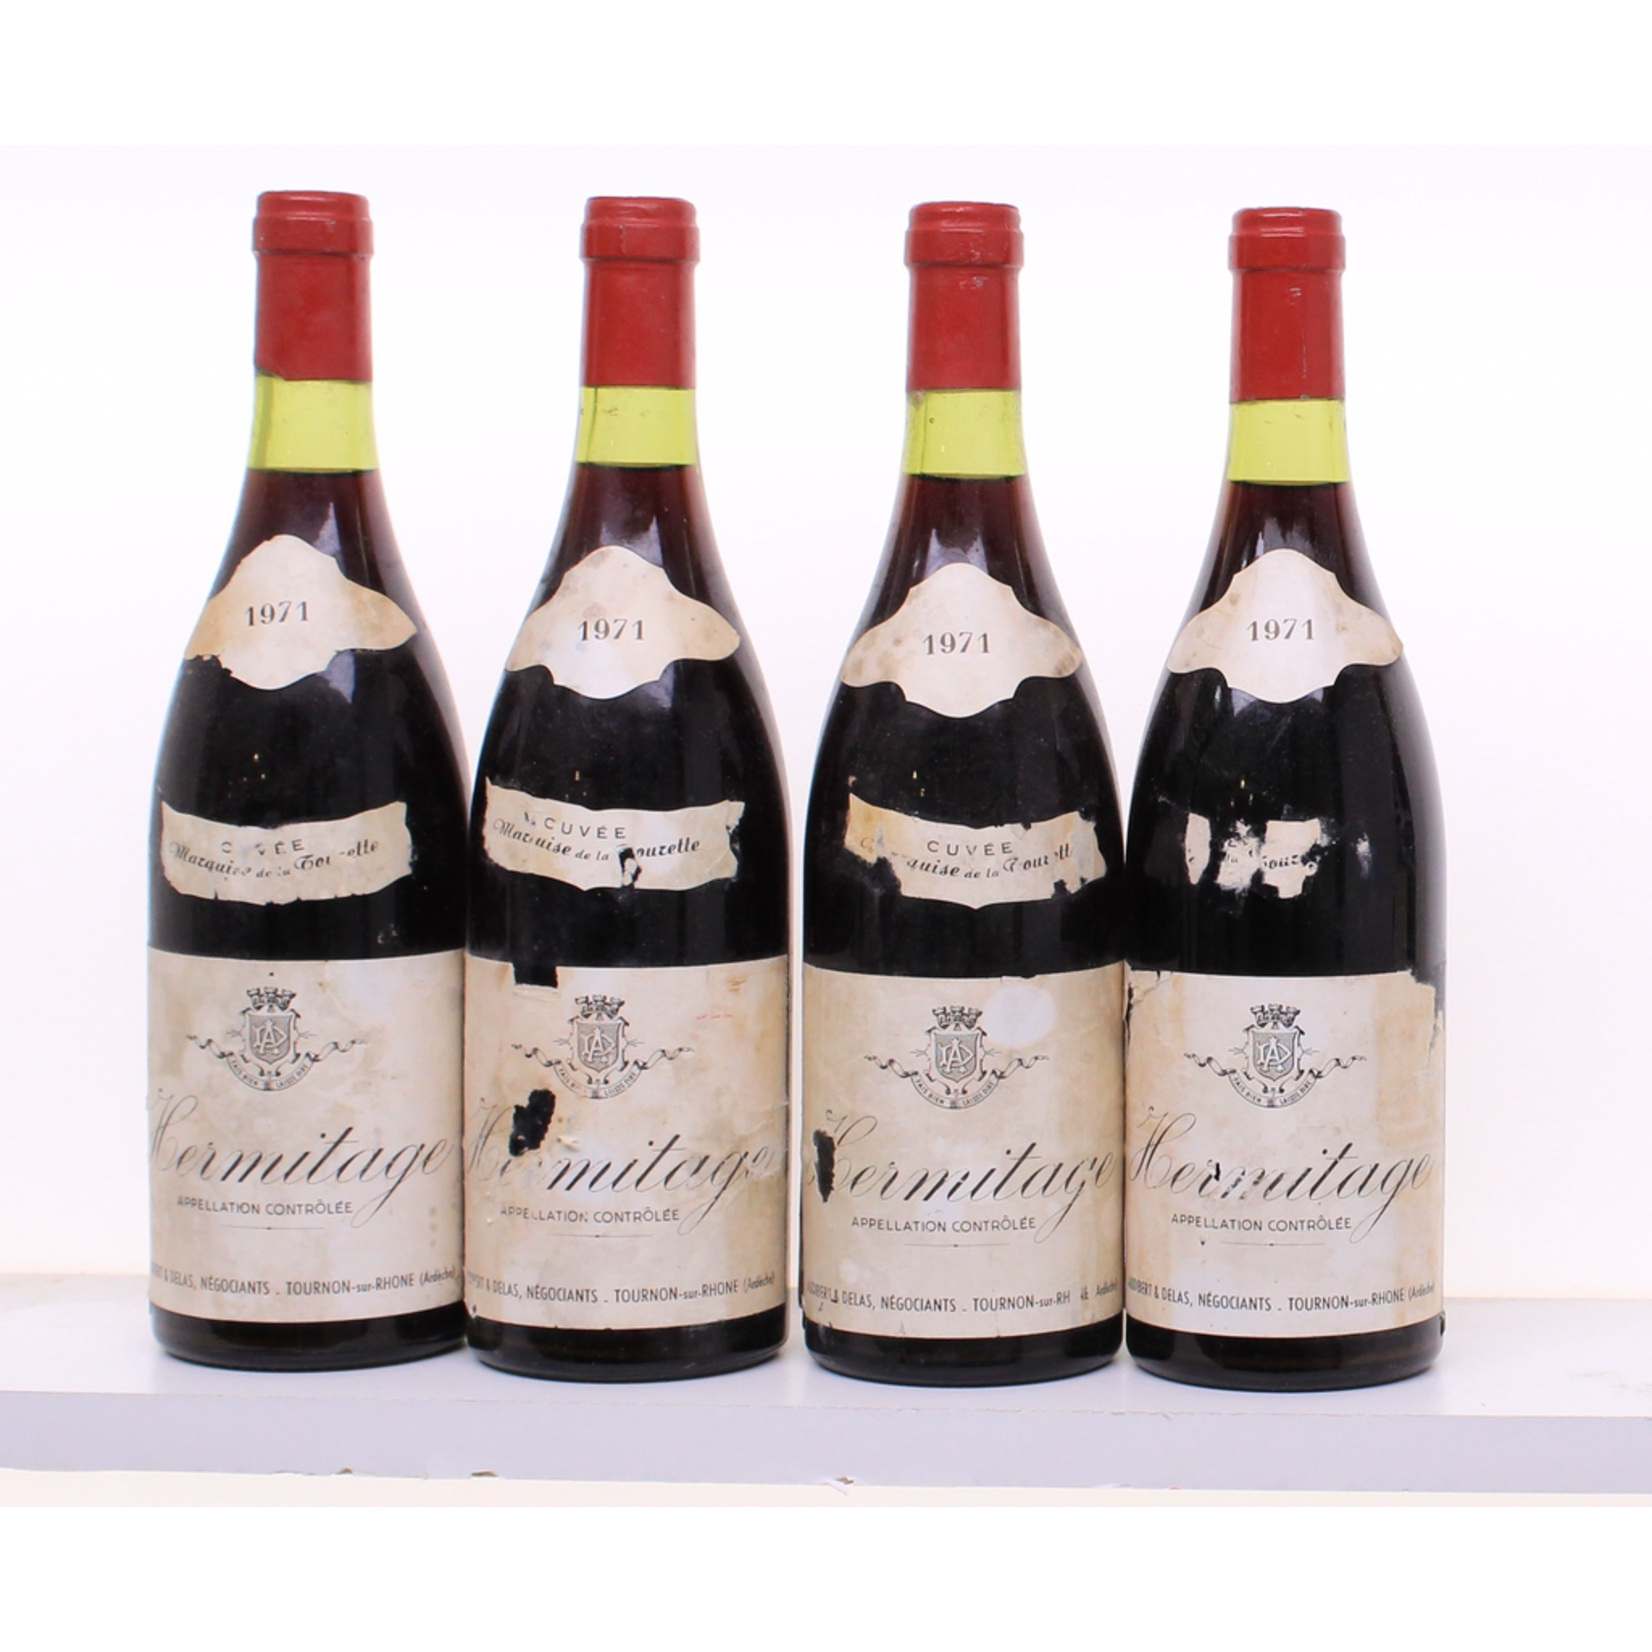 Wine Audibert & Delas Hermitage Cuvee Marquise Tourette 1971